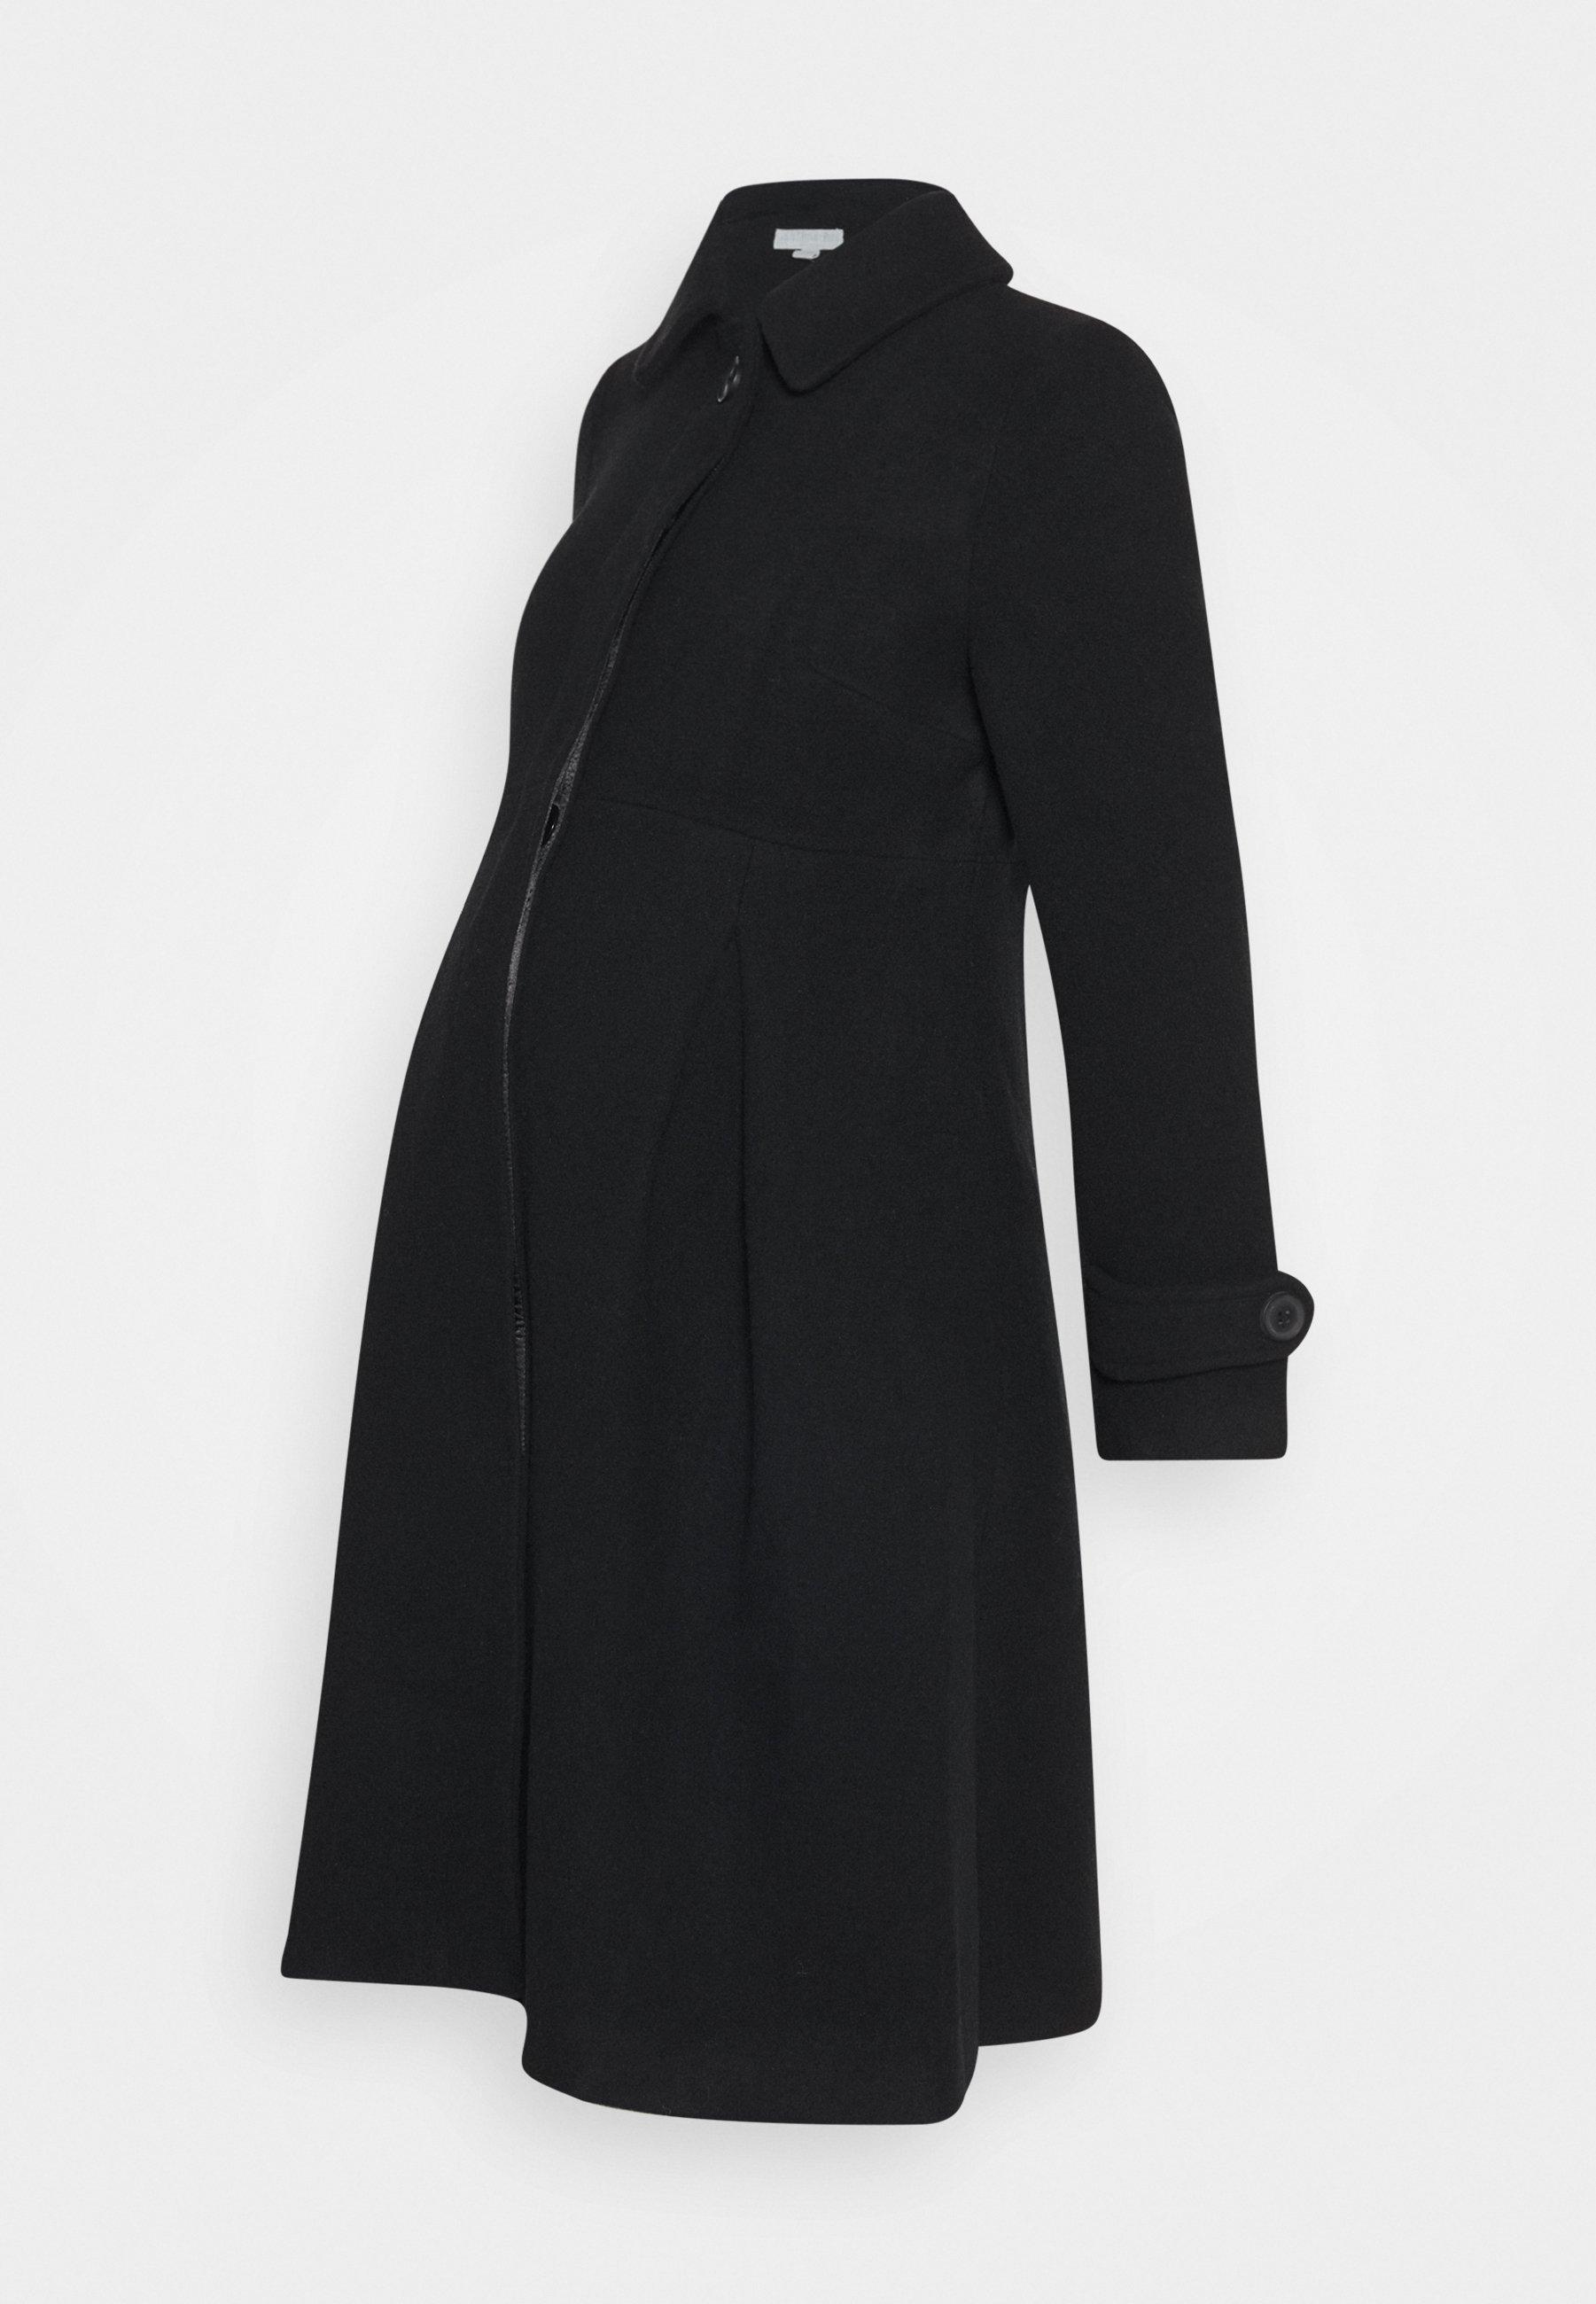 Femme TAILORED COAT - Manteau classique